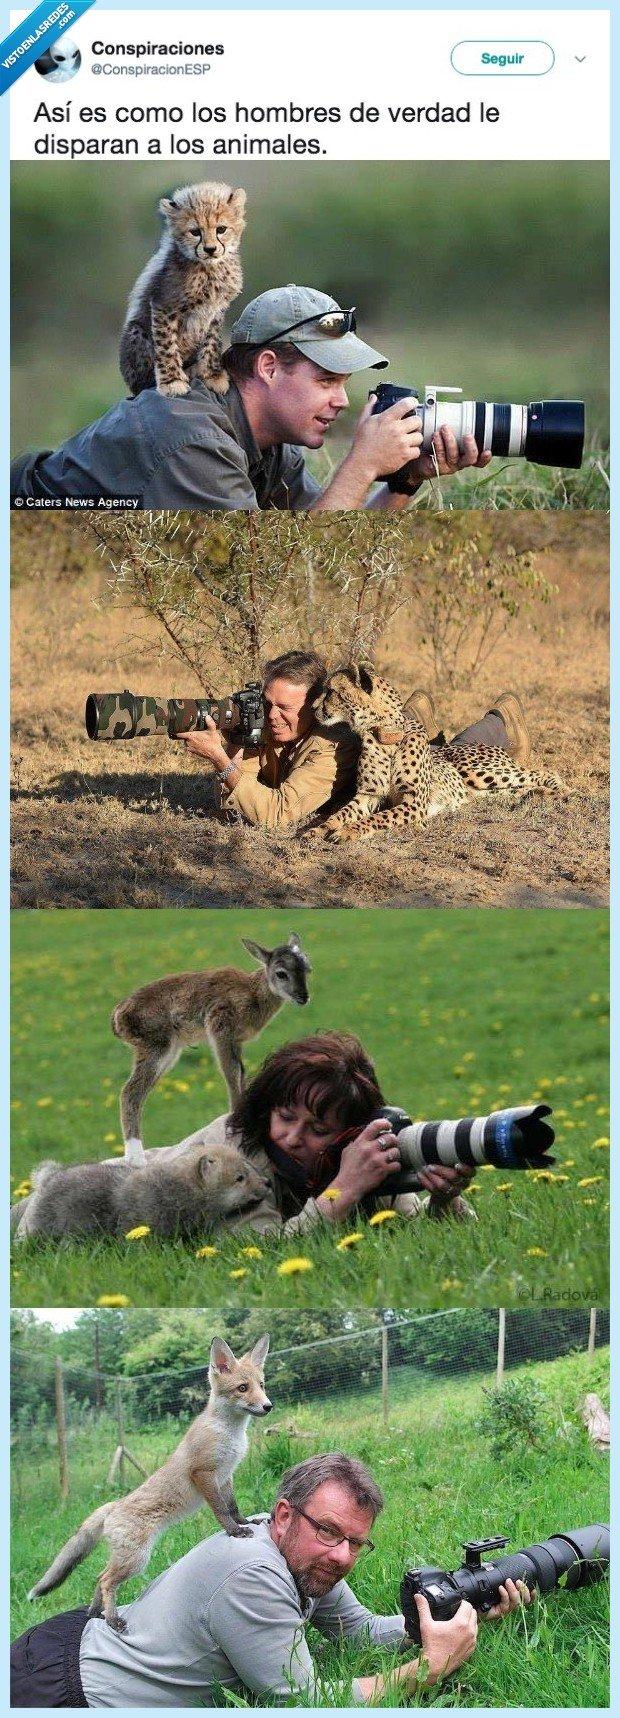 animales,disparar,manera